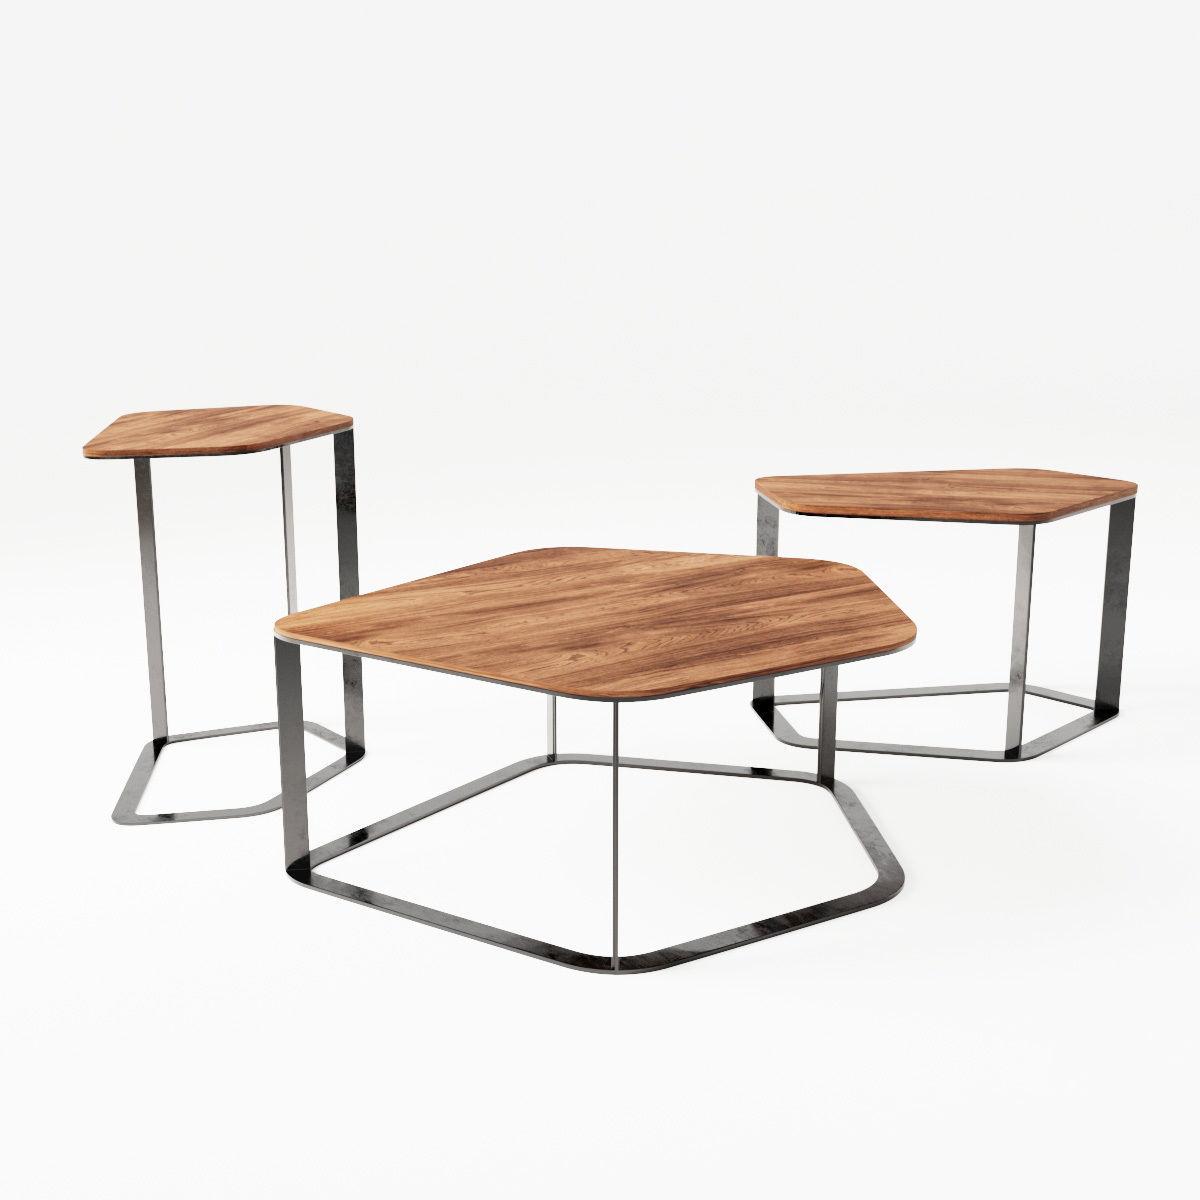 Bernhardt Design Chance Coffee Table